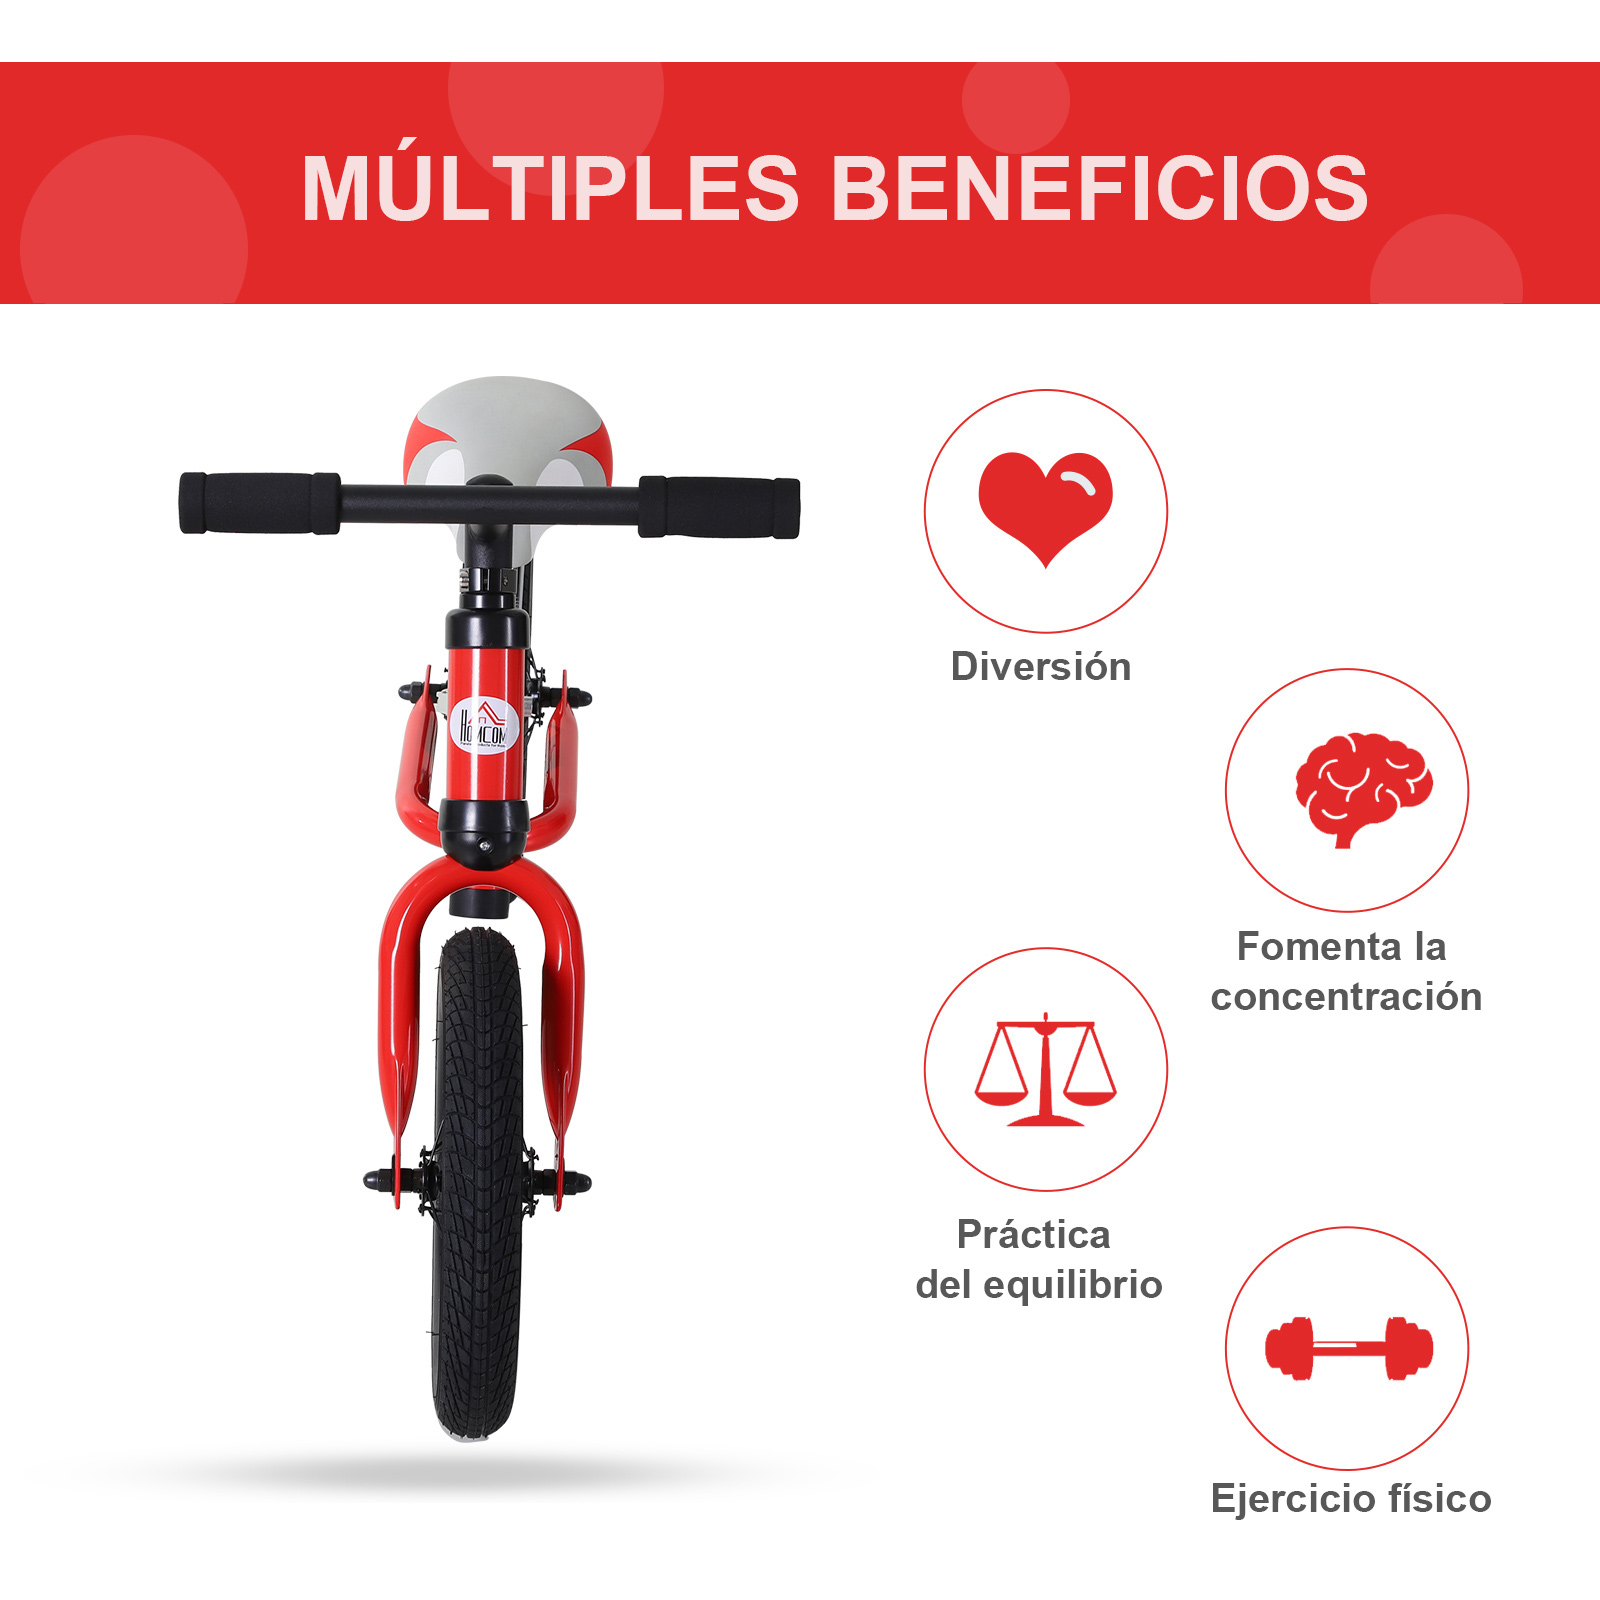 Bicicleta-sin-Pedales-de-Altura-de-Asiento-Regulable-31-45cm-2-5-Anos miniatura 18